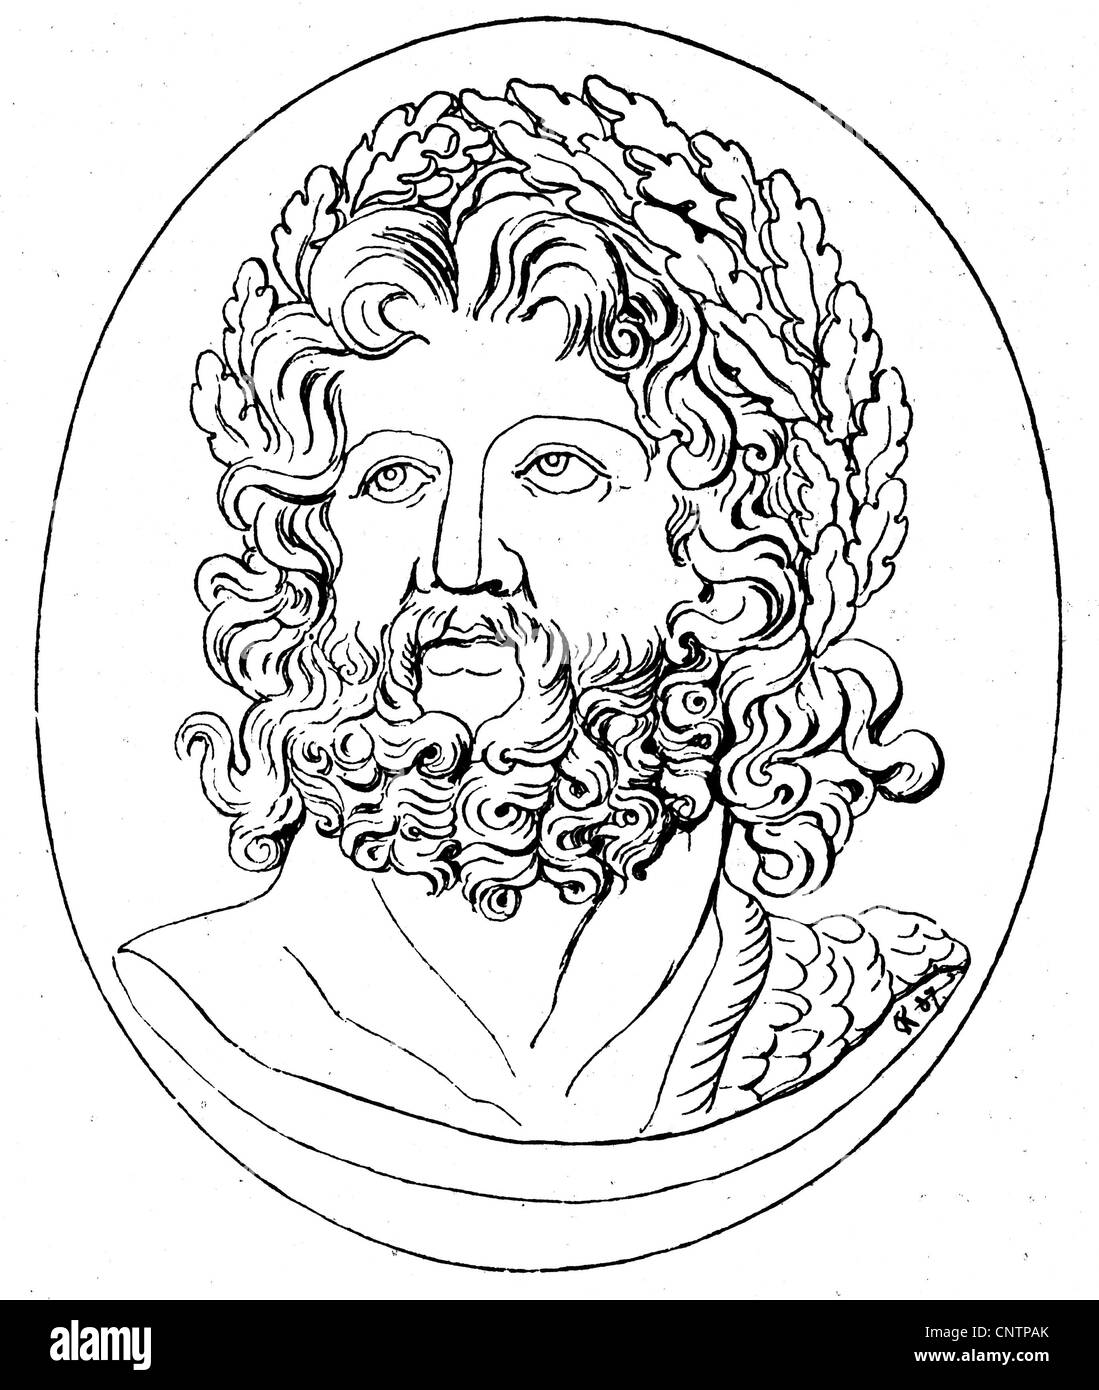 Zeus (Latin: Jupiter), Greek 'divine king', leader of gods, god of sky and thunder, portrait, head with - Stock Image